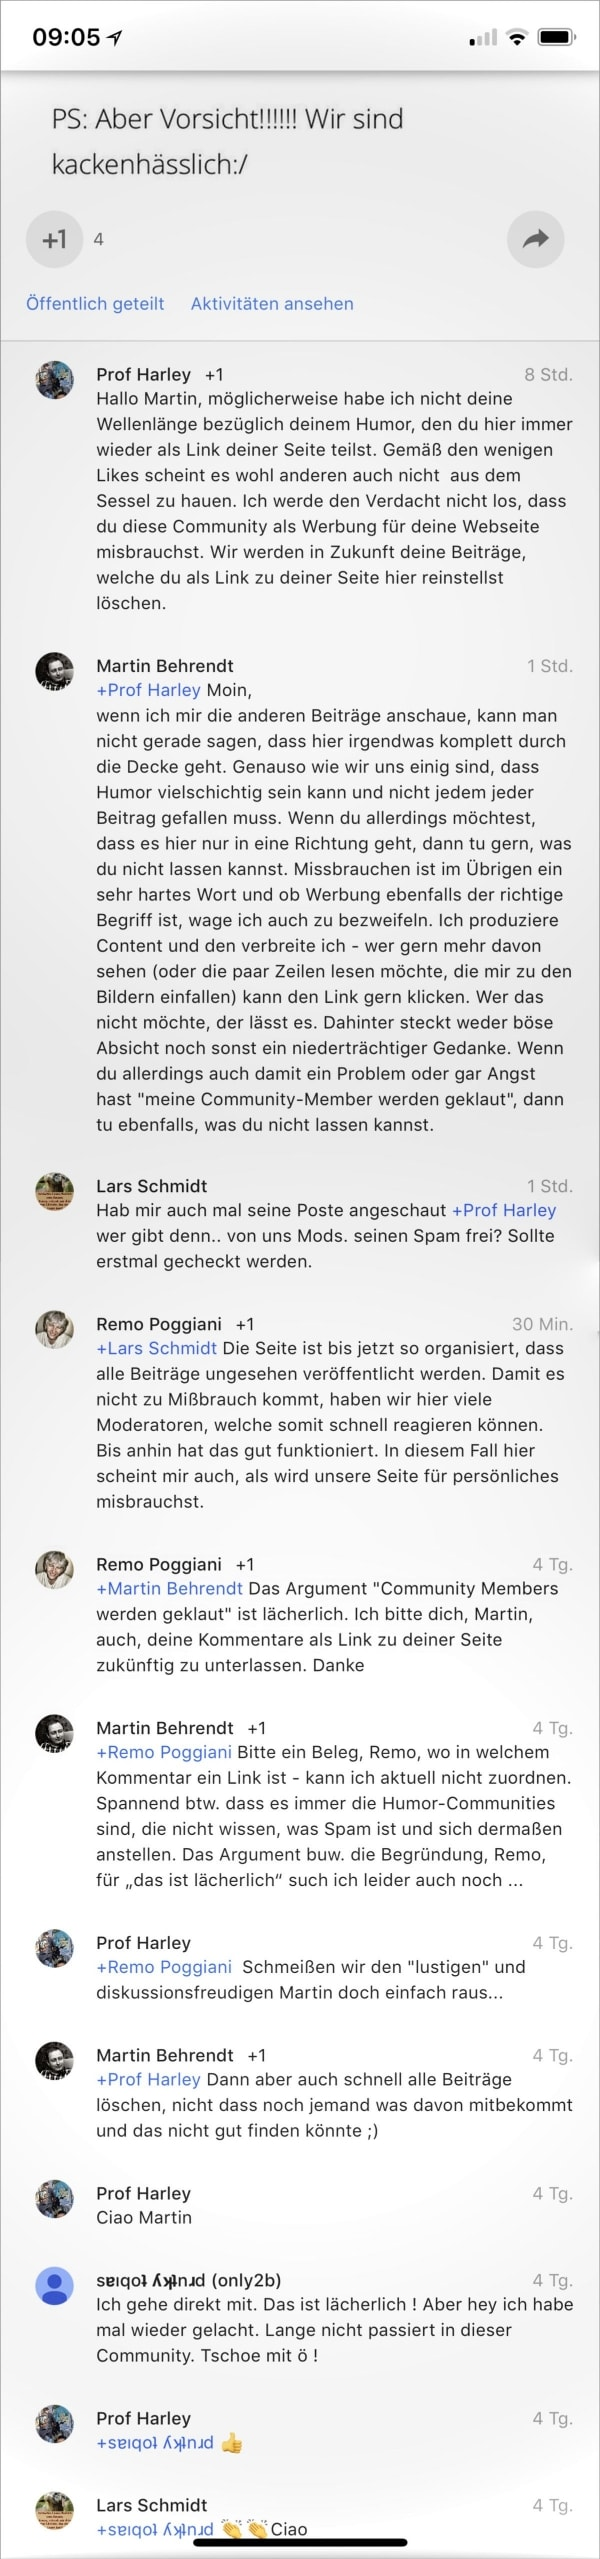 So geht Community. Nicht. - Gedankentüdelüt (107) | Kolumne | Was is hier eigentlich los? | wihel.de